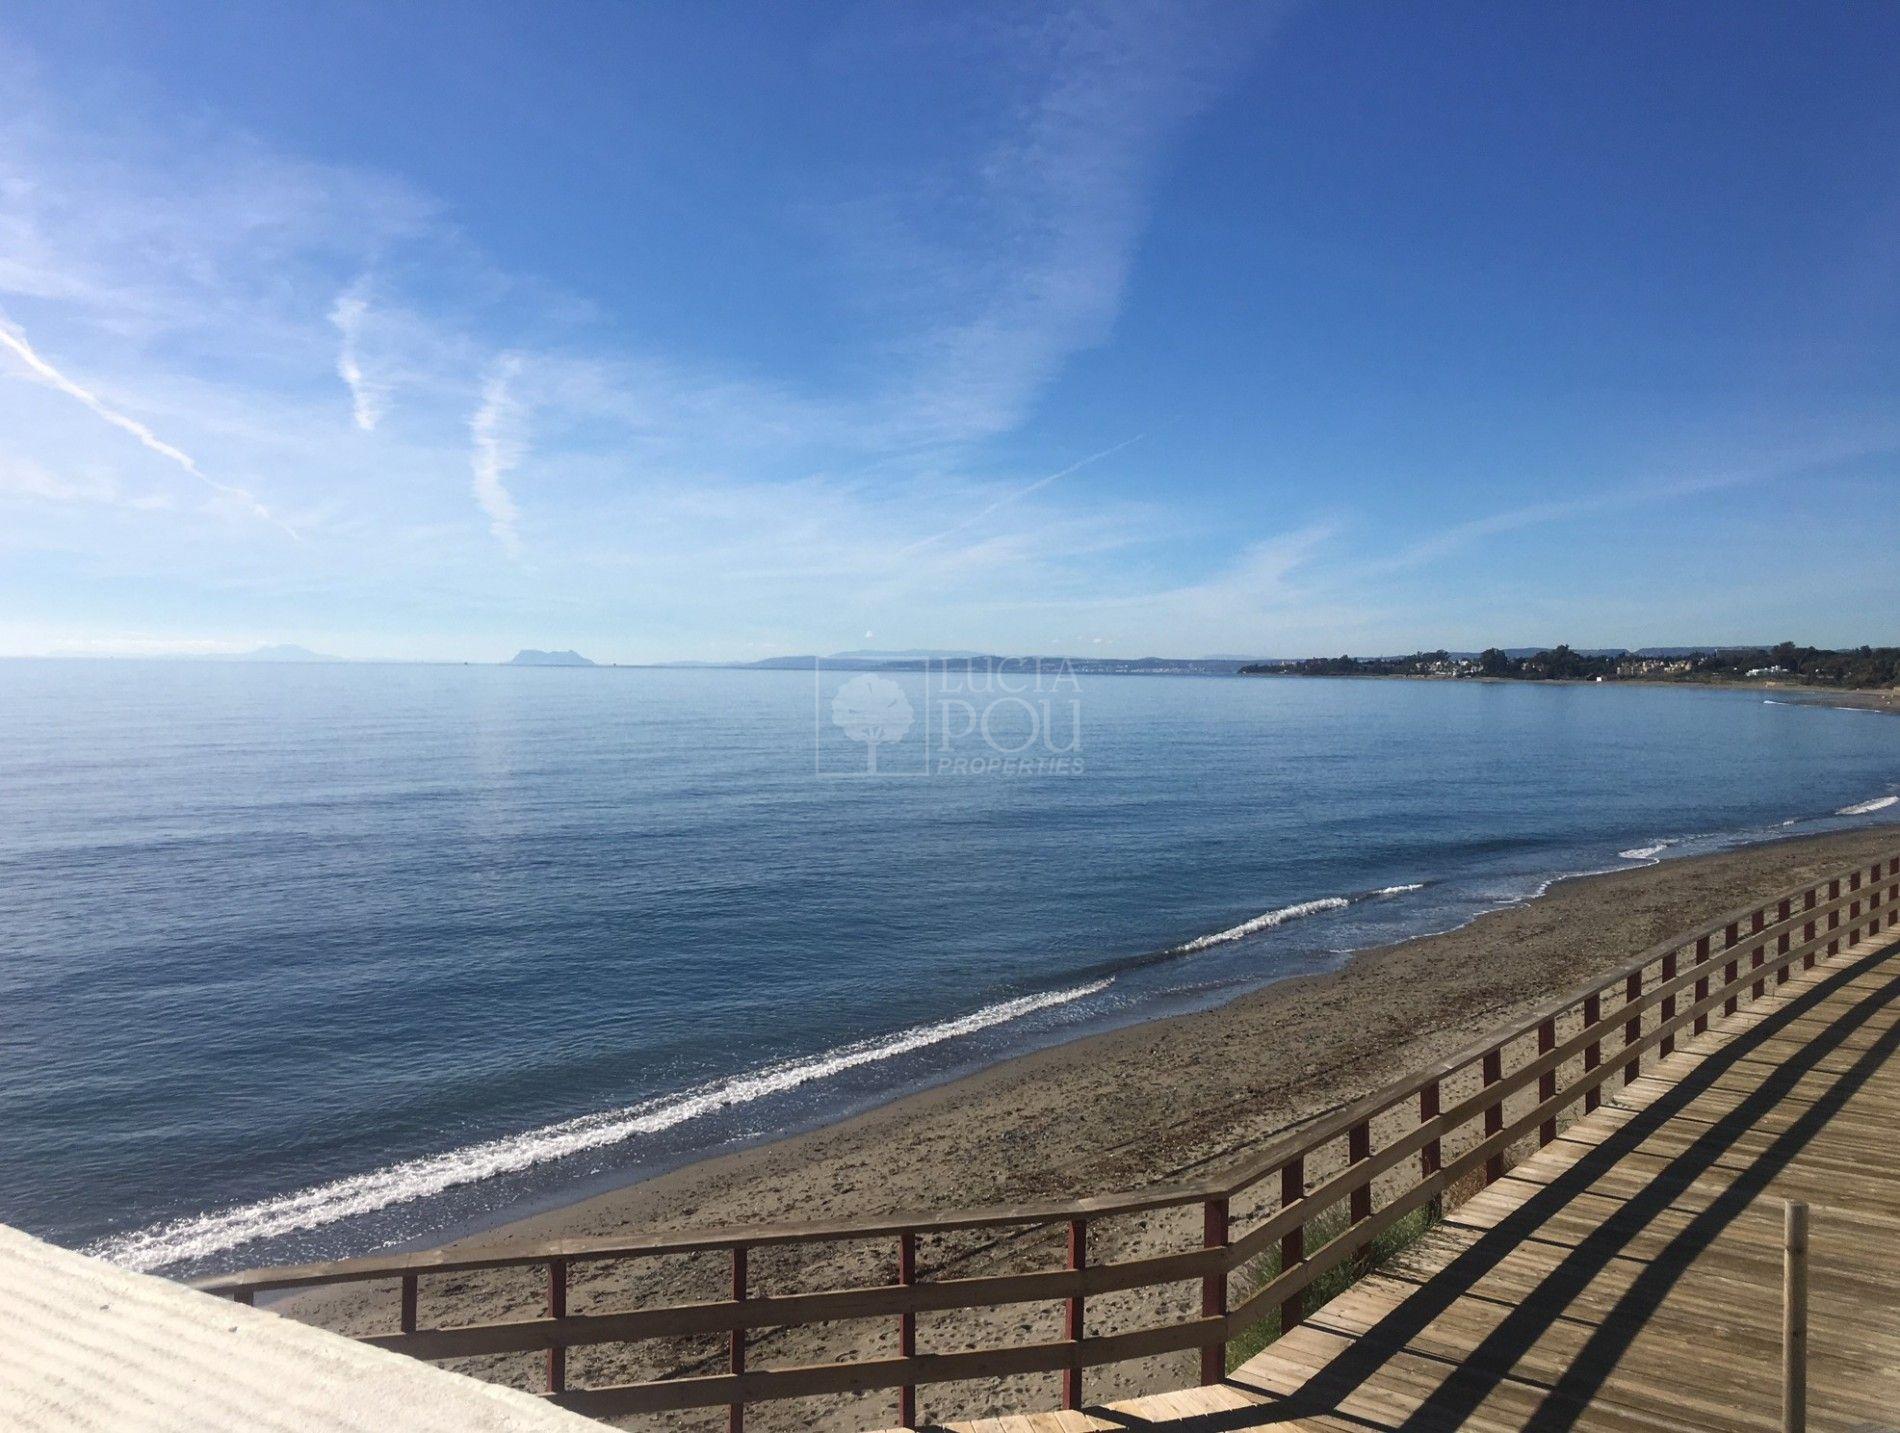 Adosado  en Beach Side New Golden Mile, Estepona